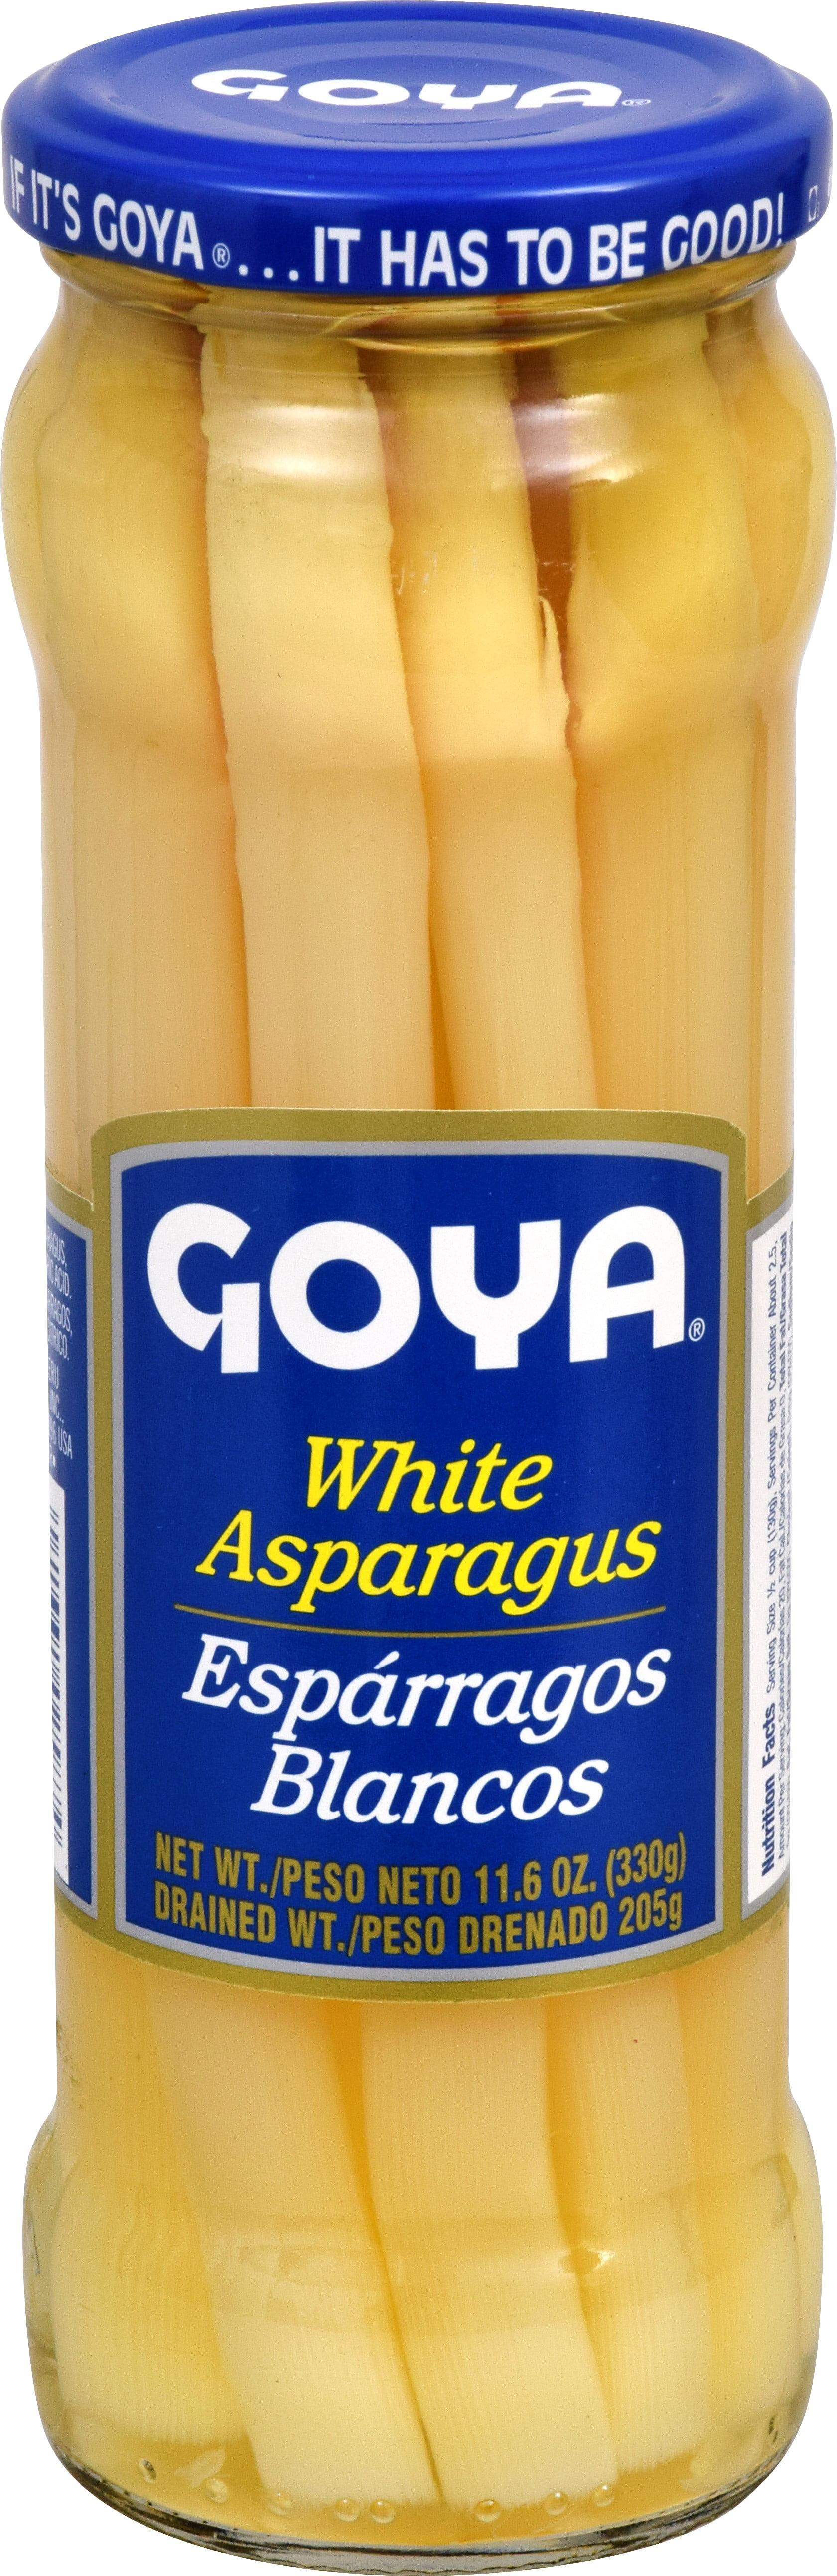 (6 Pack) Goya White Asparagus, 11.6 oz